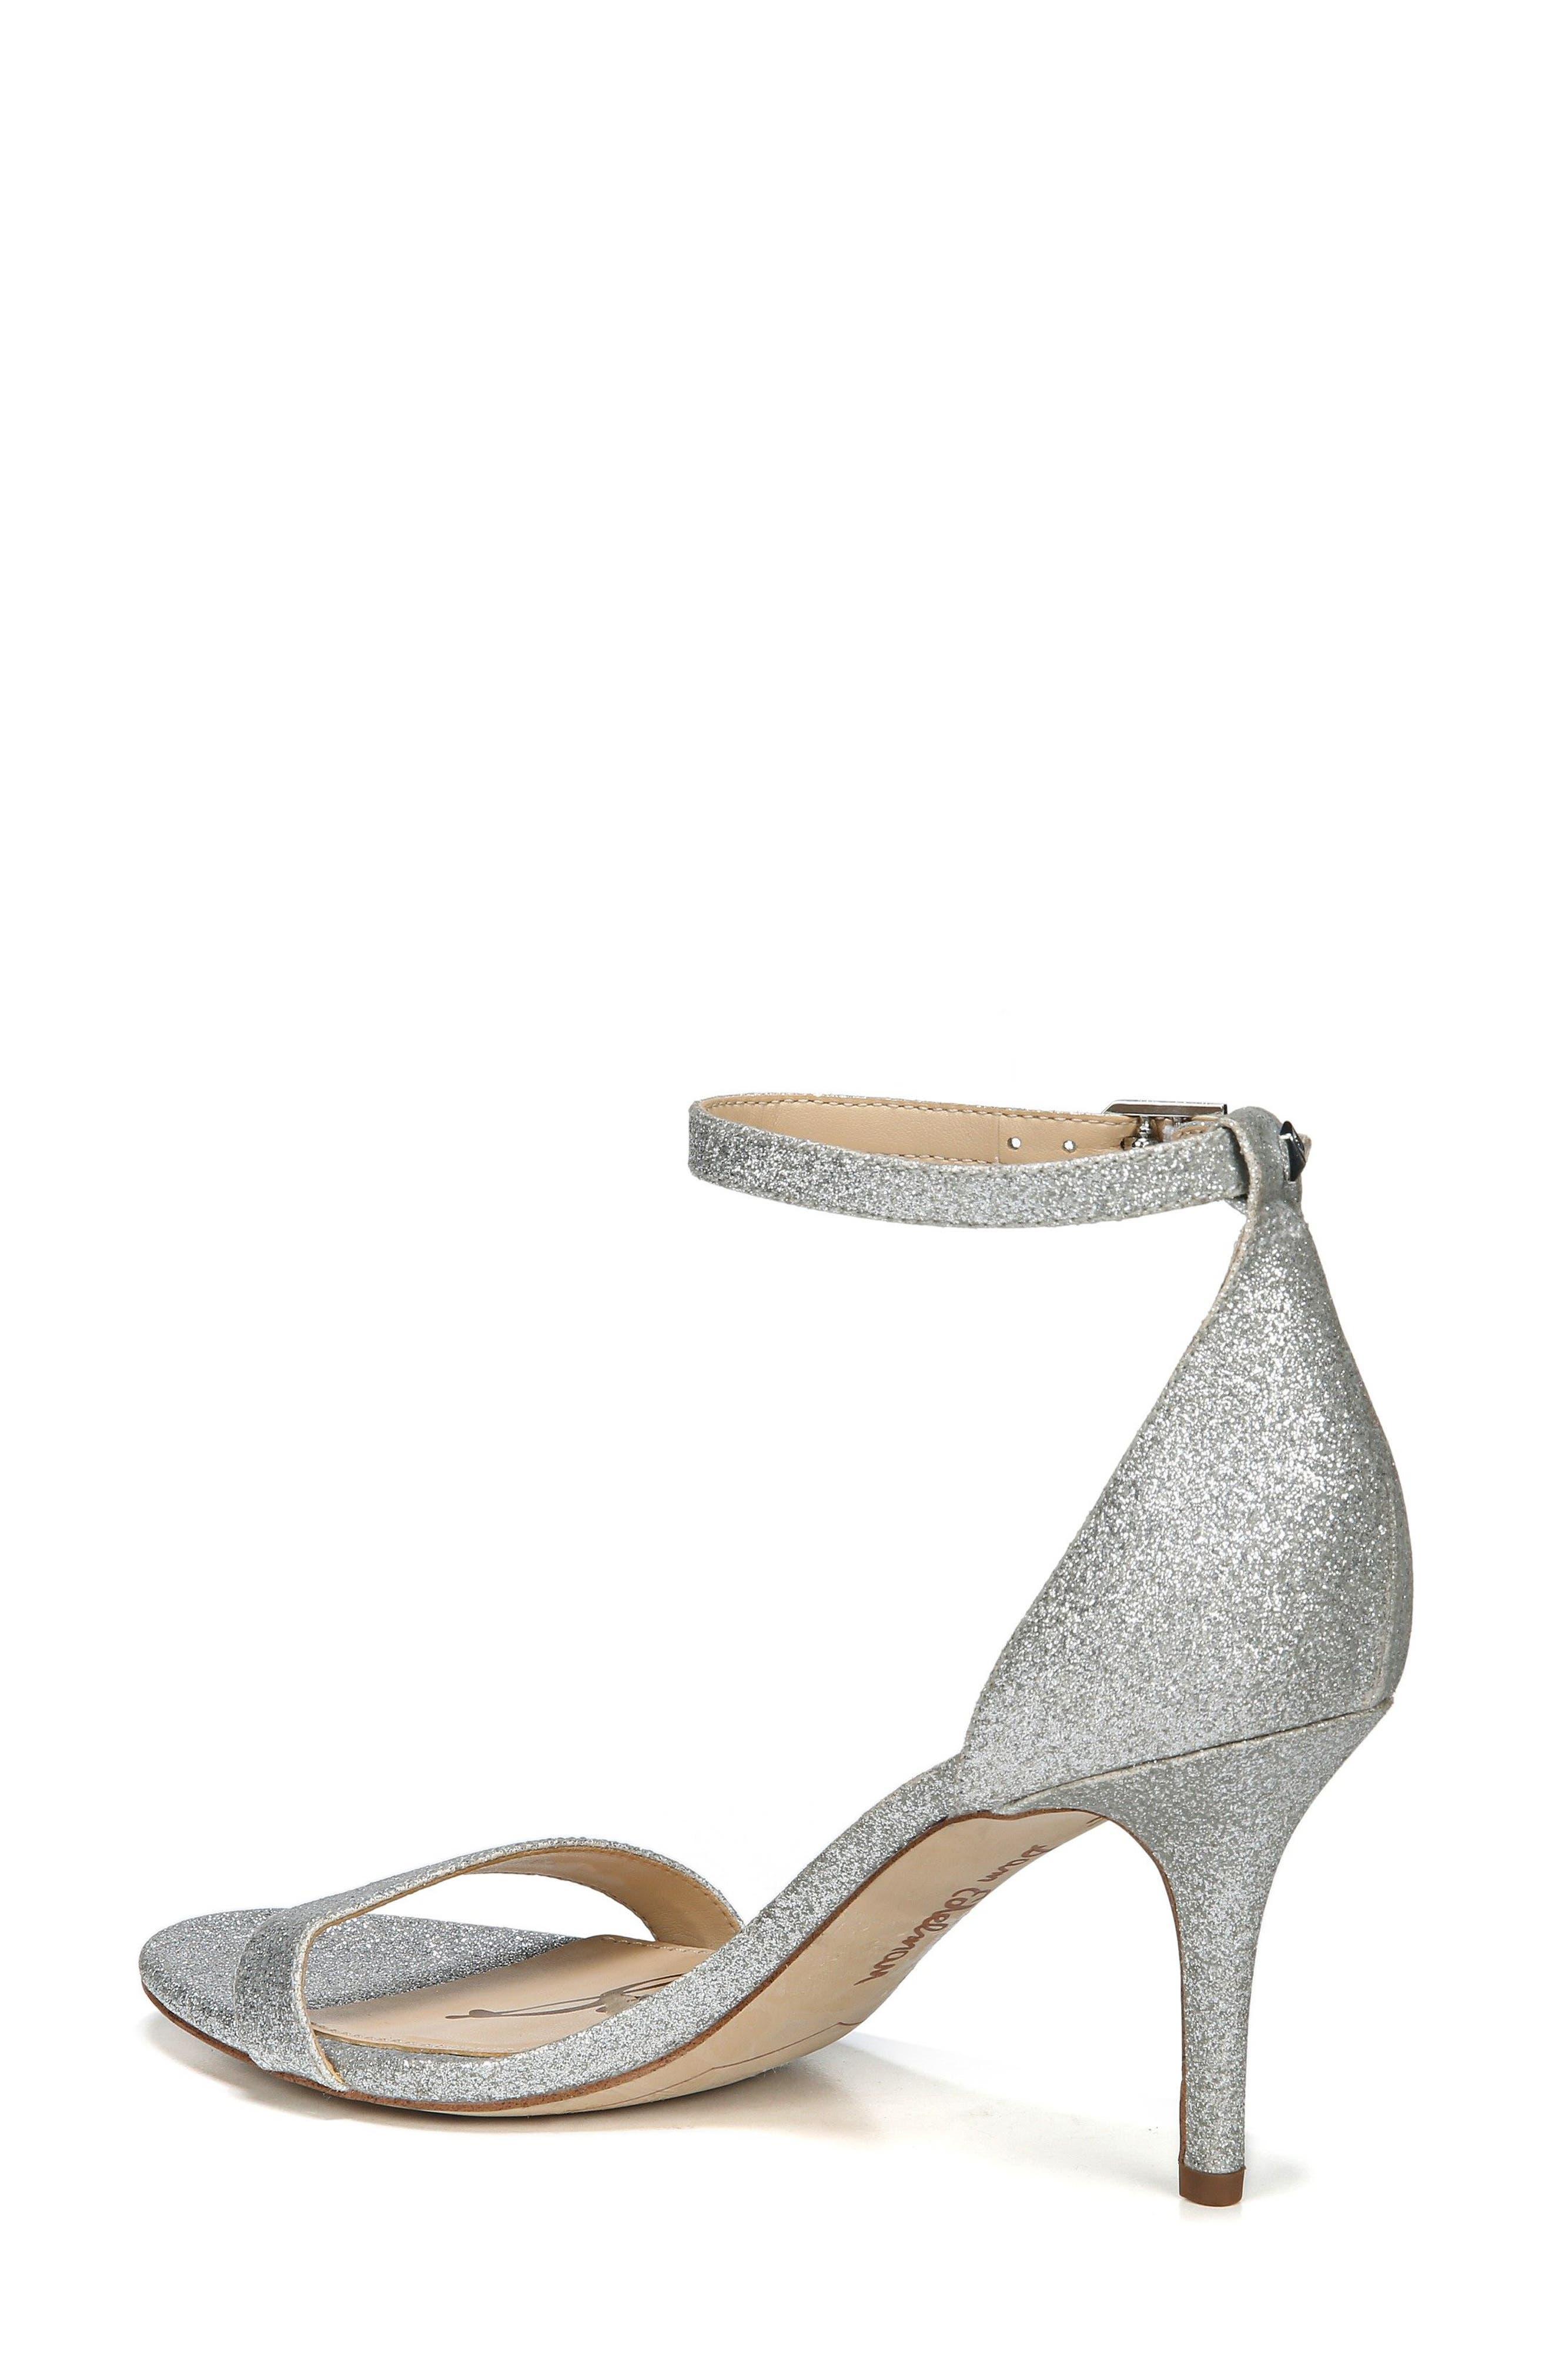 ,                             'Patti' Ankle Strap Sandal,                             Alternate thumbnail 46, color,                             045